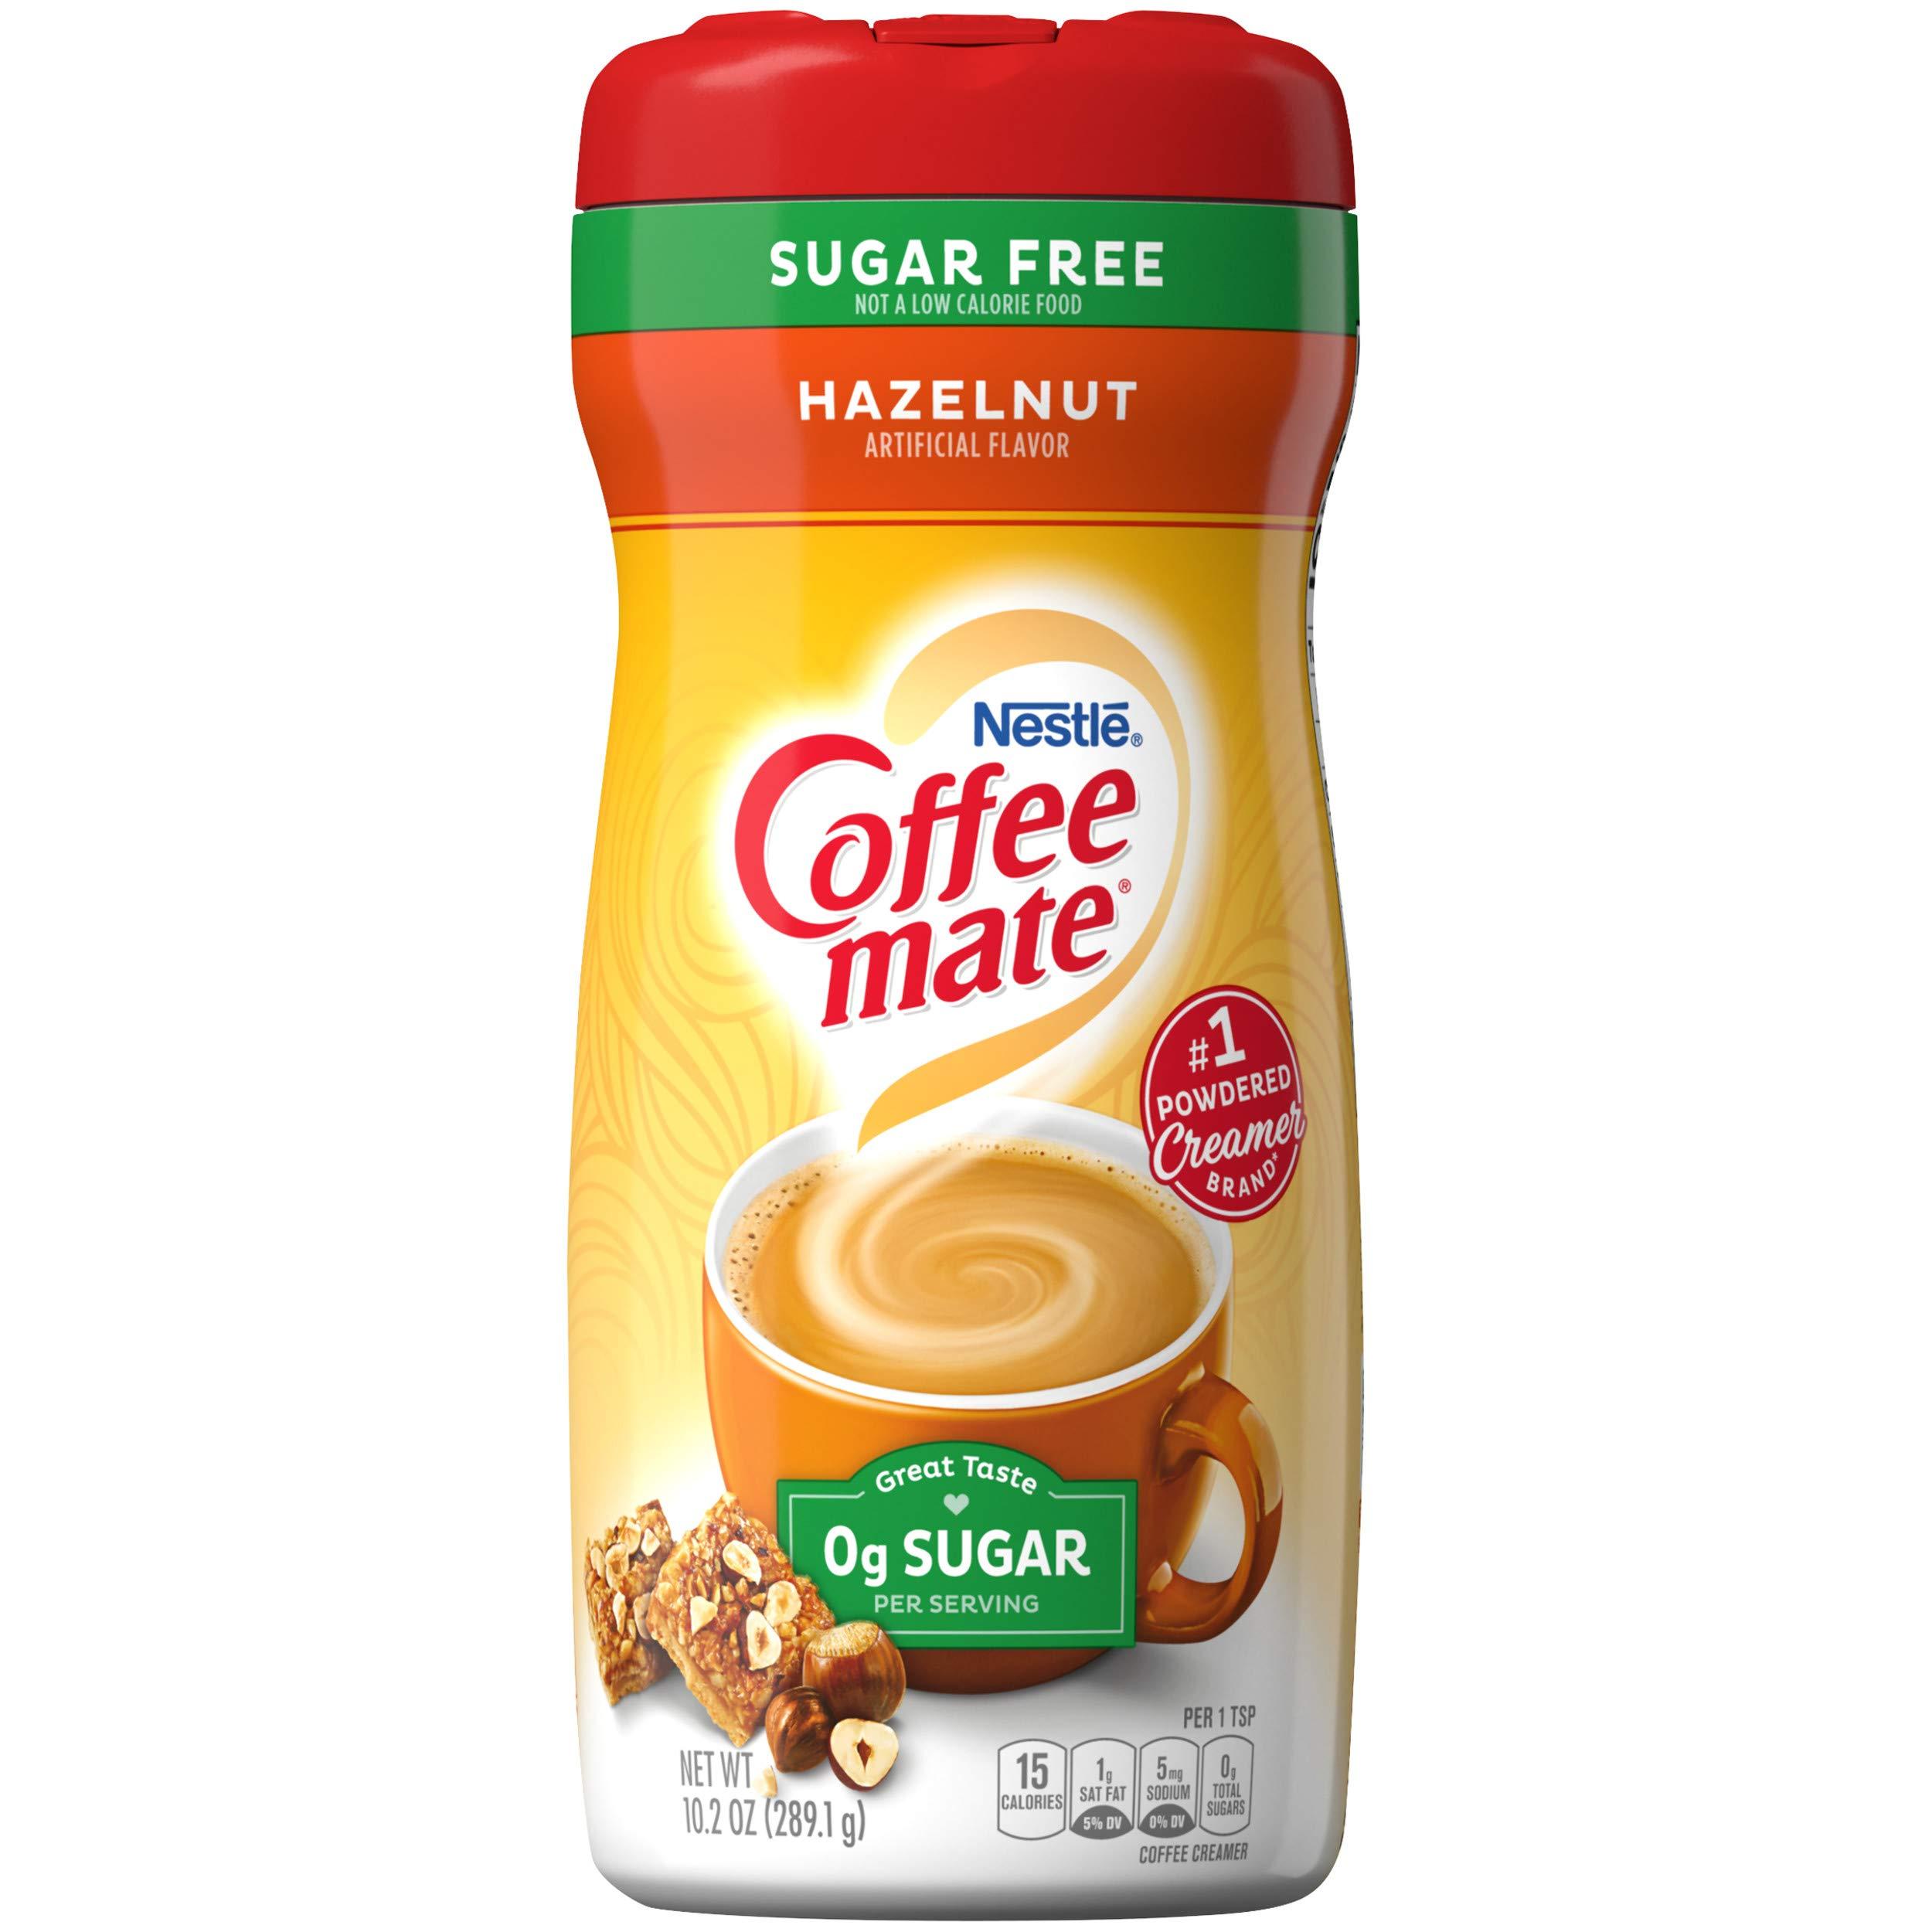 Nestle Coffee mate Sugar Free Powder Creamer, Hazelnut, 10.2 Ounce